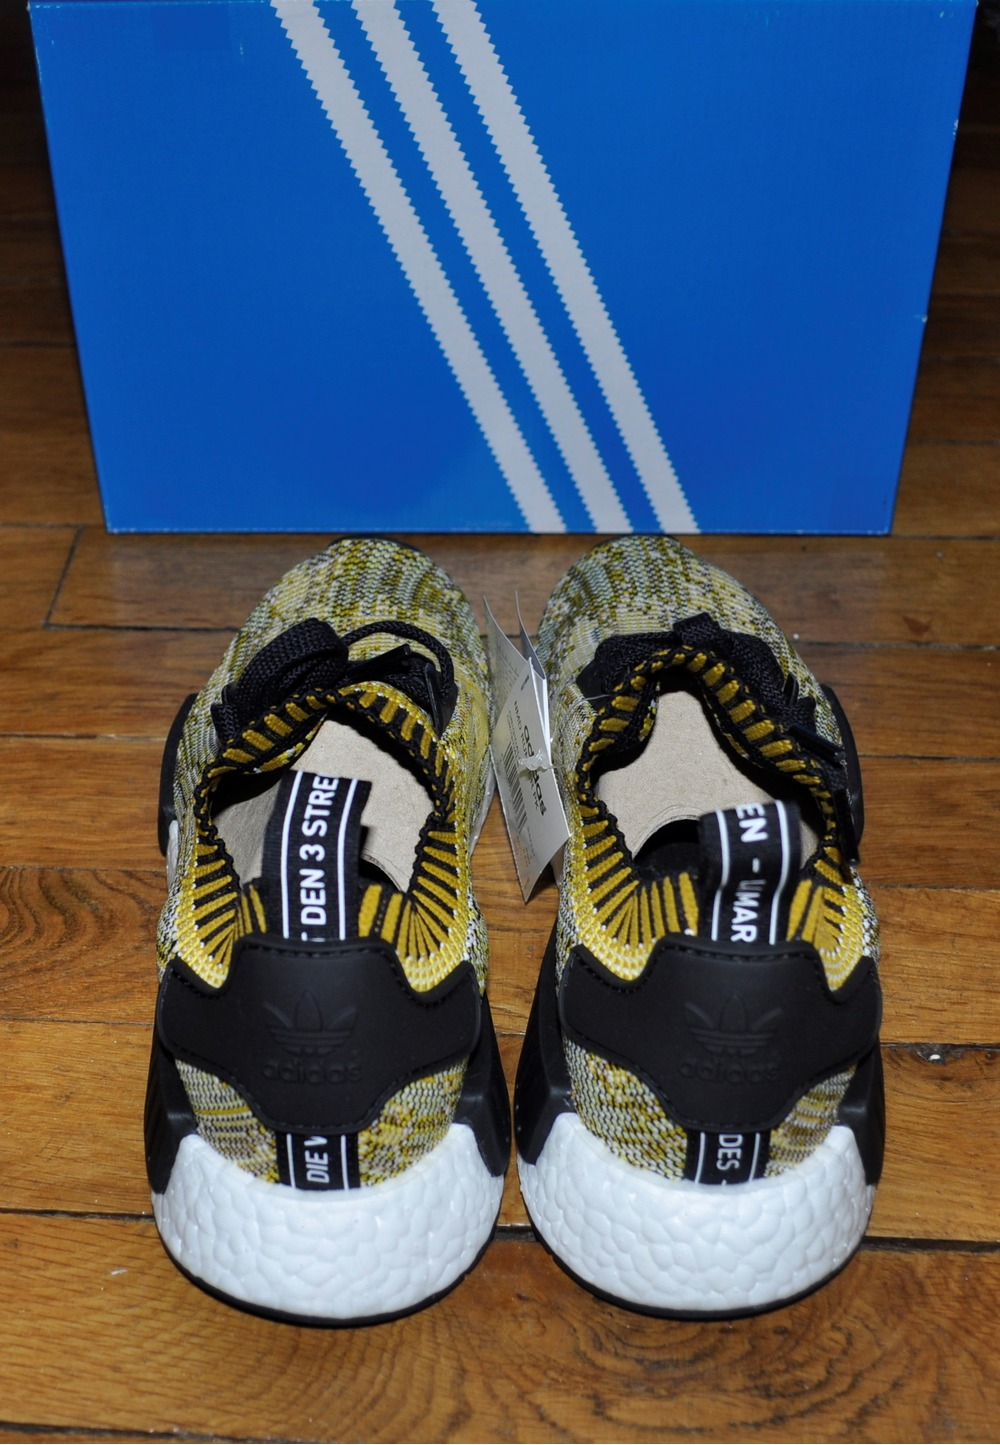 adidas NMD Runner R1 PK Yellow Black adidas Shoes Yellow